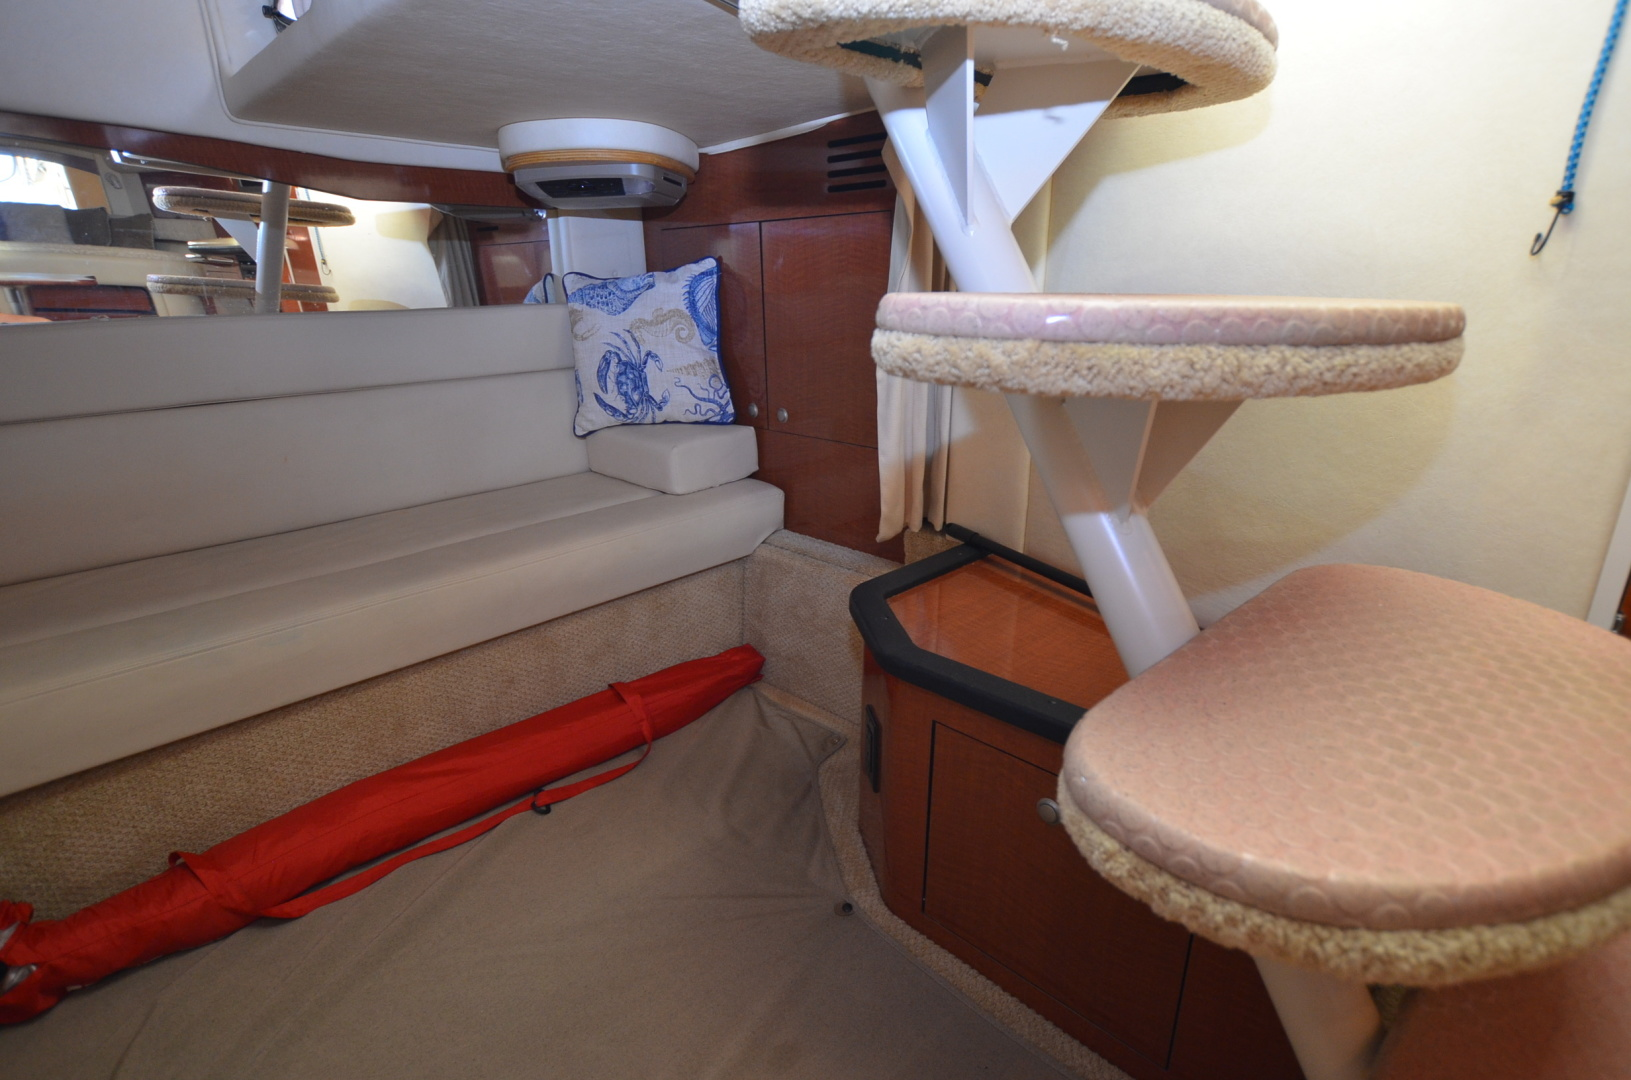 Sea Ray-340 Sundancer 2005-Better Place Palm Harbor-Florida-United States-1562834 | Thumbnail